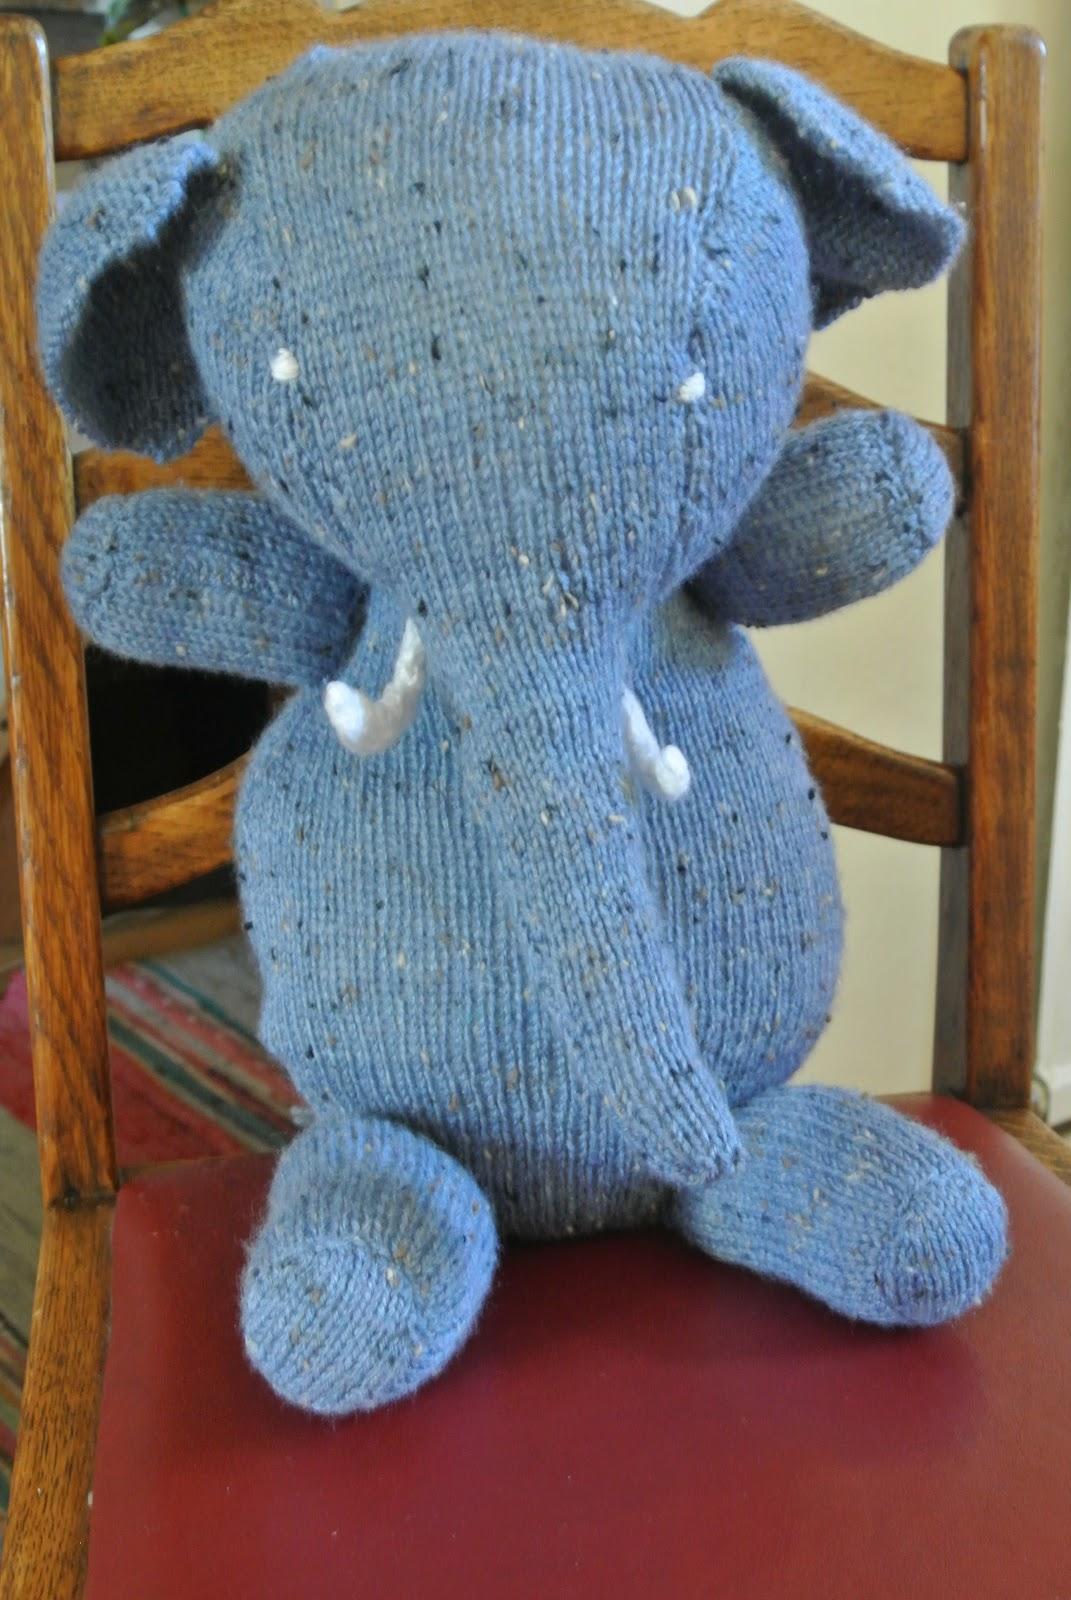 Battersea Dog Blanket Knitting Pattern : Sew many yarns: January 2013